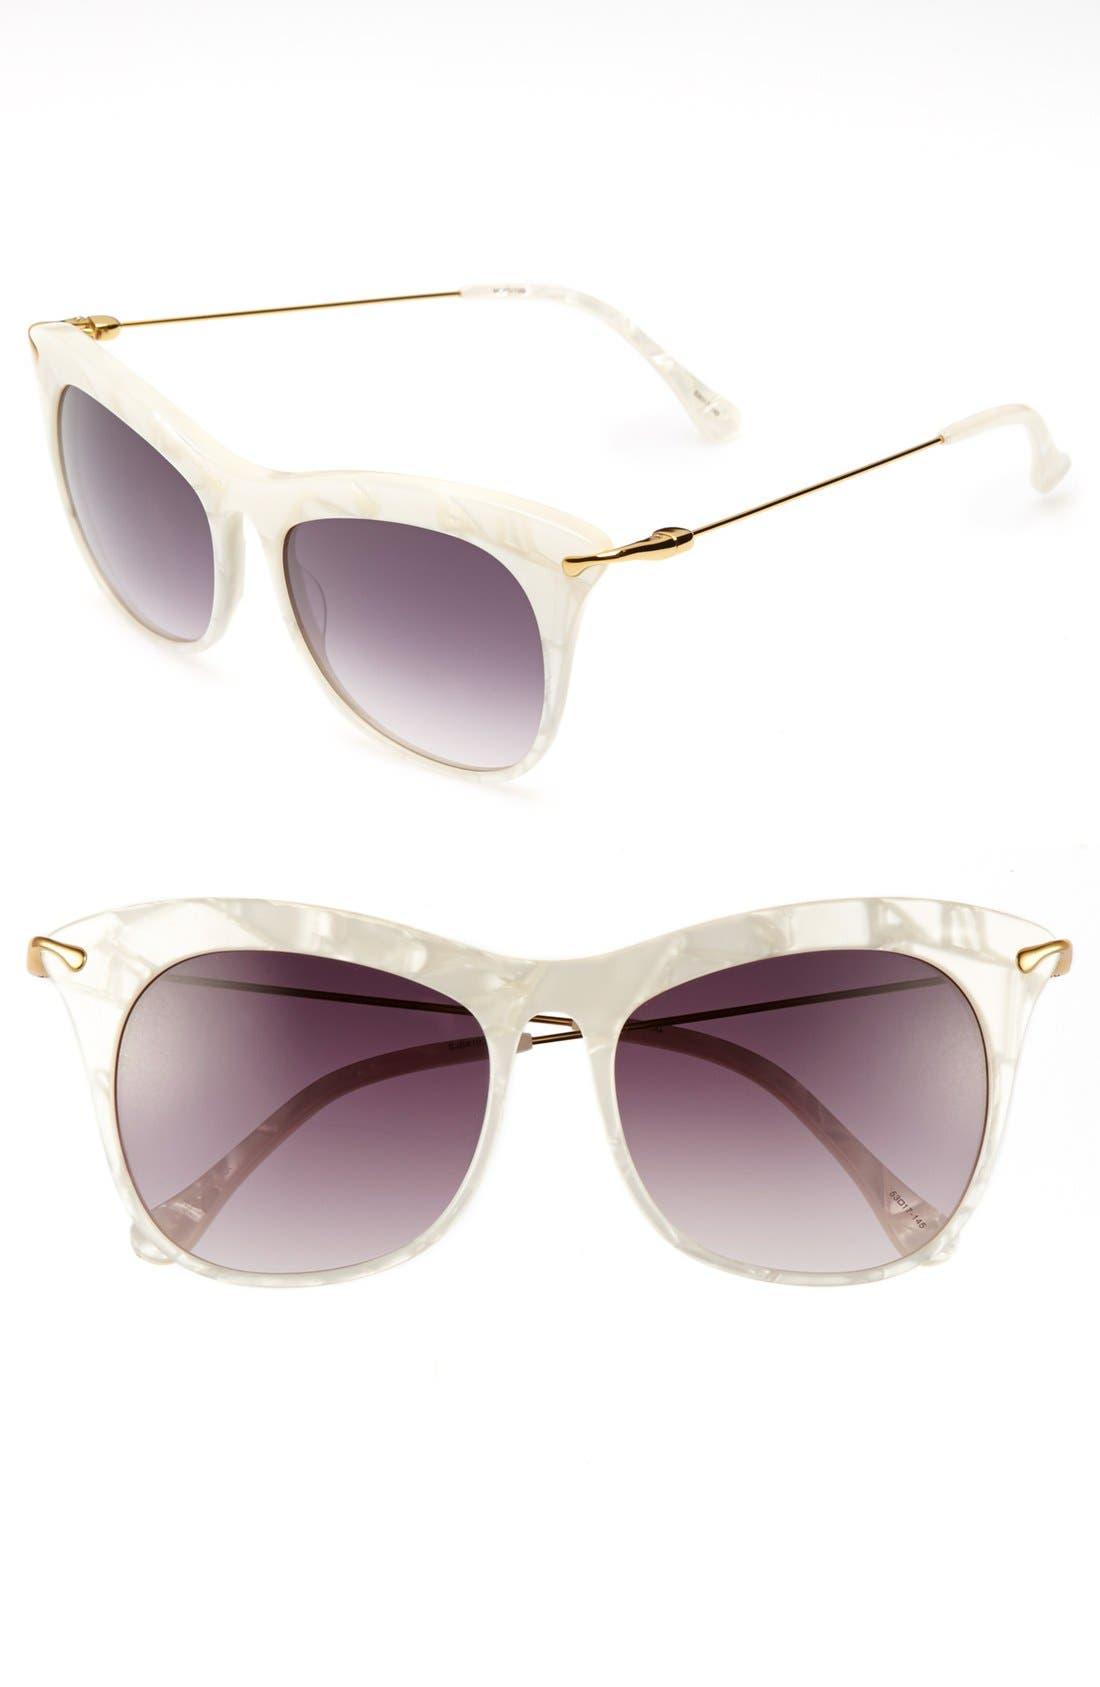 Alternate Image 1 Selected - Elizabeth and James 'Fairfax' 53mm Sunglasses